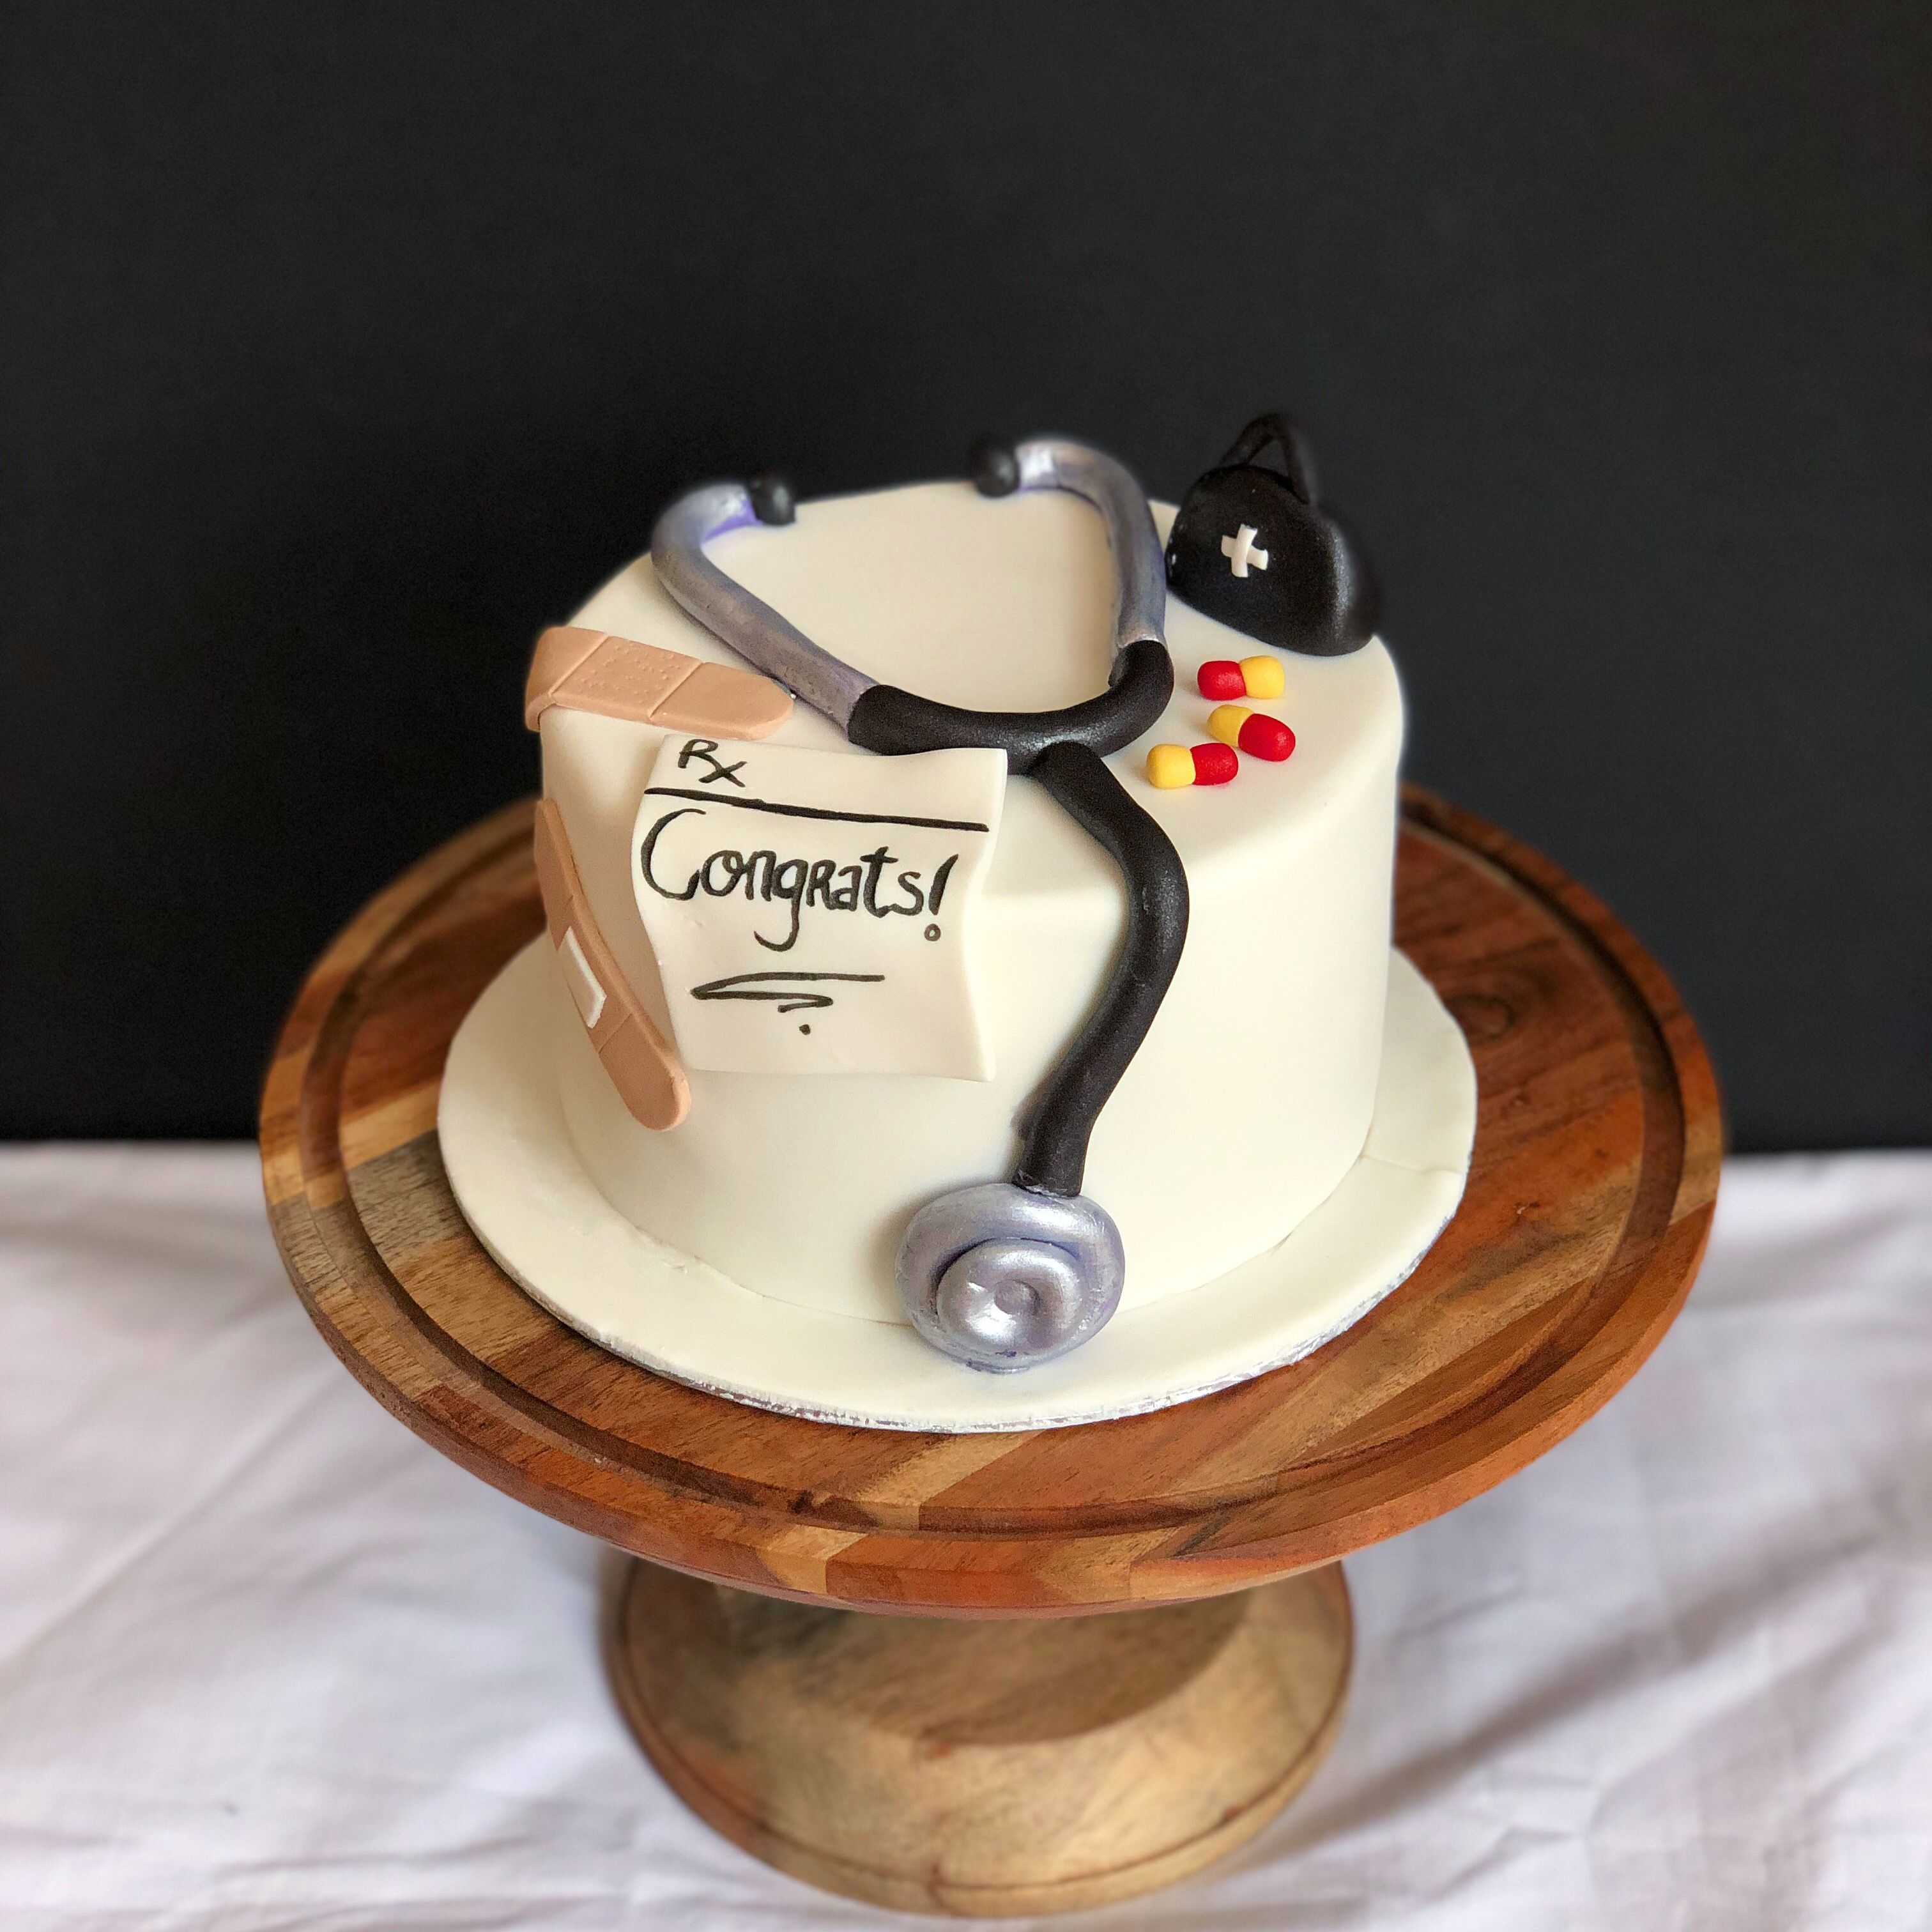 Doctor themed cake themed cakes cake dessert cupcakes